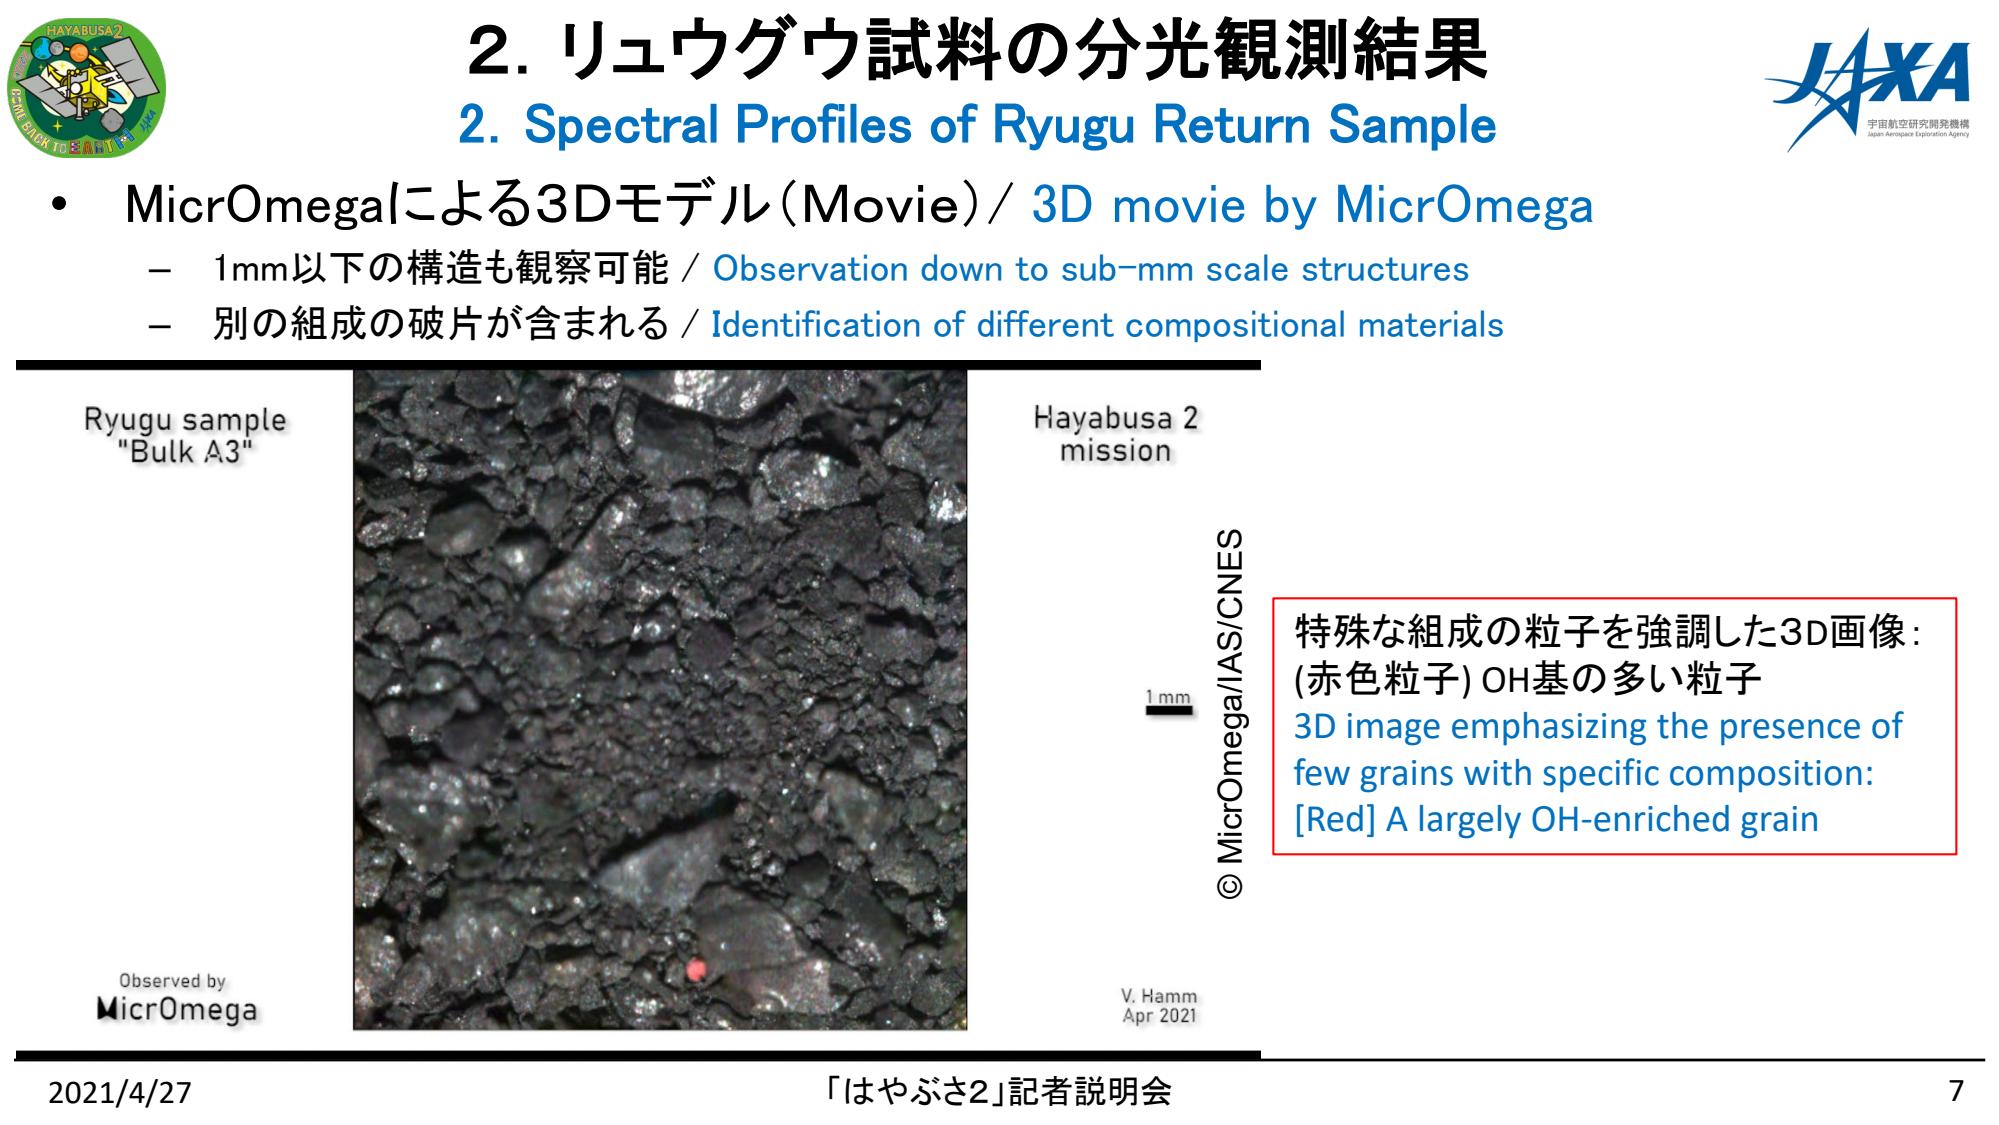 f:id:Imamura:20210427135129p:plain